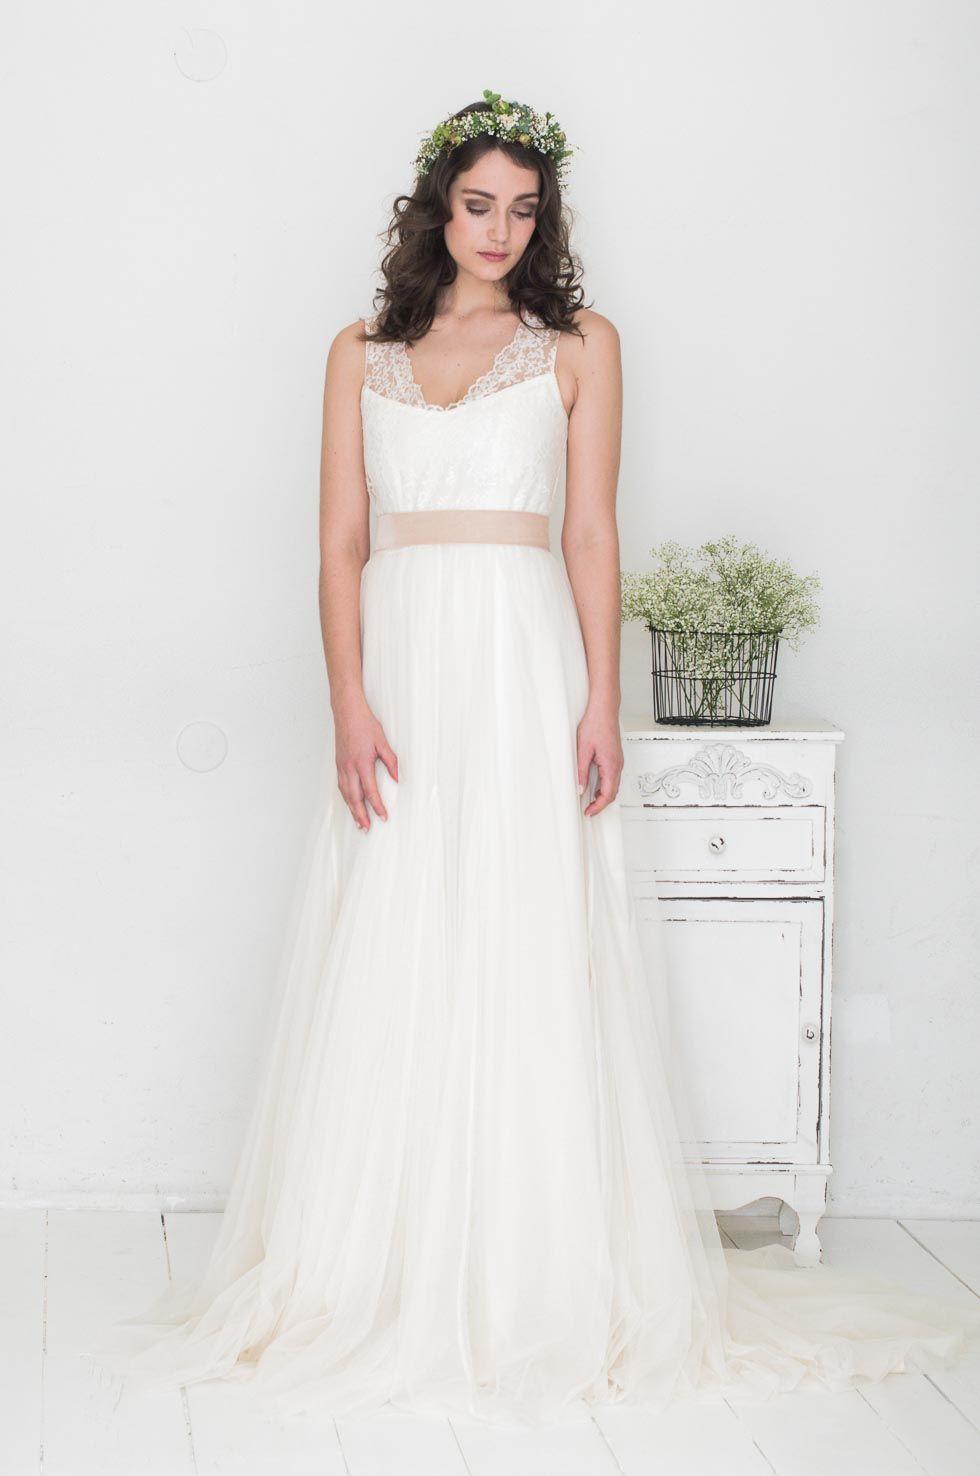 elfenkleid  Elfenkleid, Kleider, Hochzeitskleid